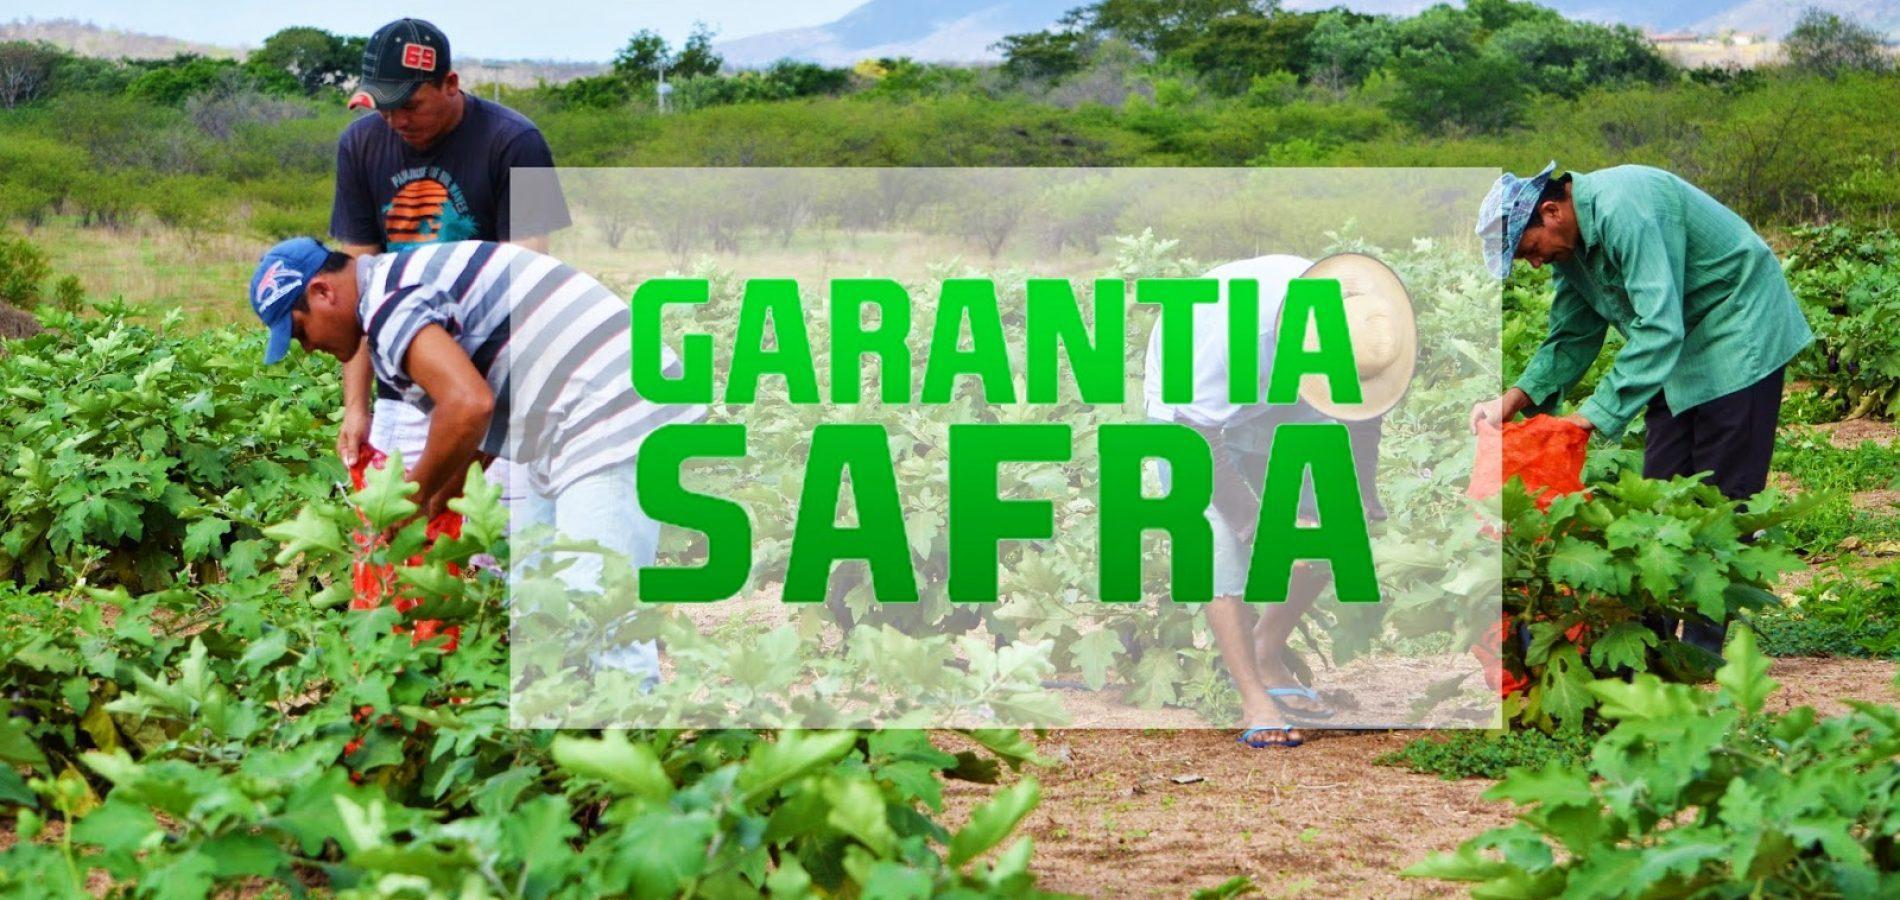 Quinhentos agricultores santanenses recebem recursos do Garantia-Safra 2017/2018